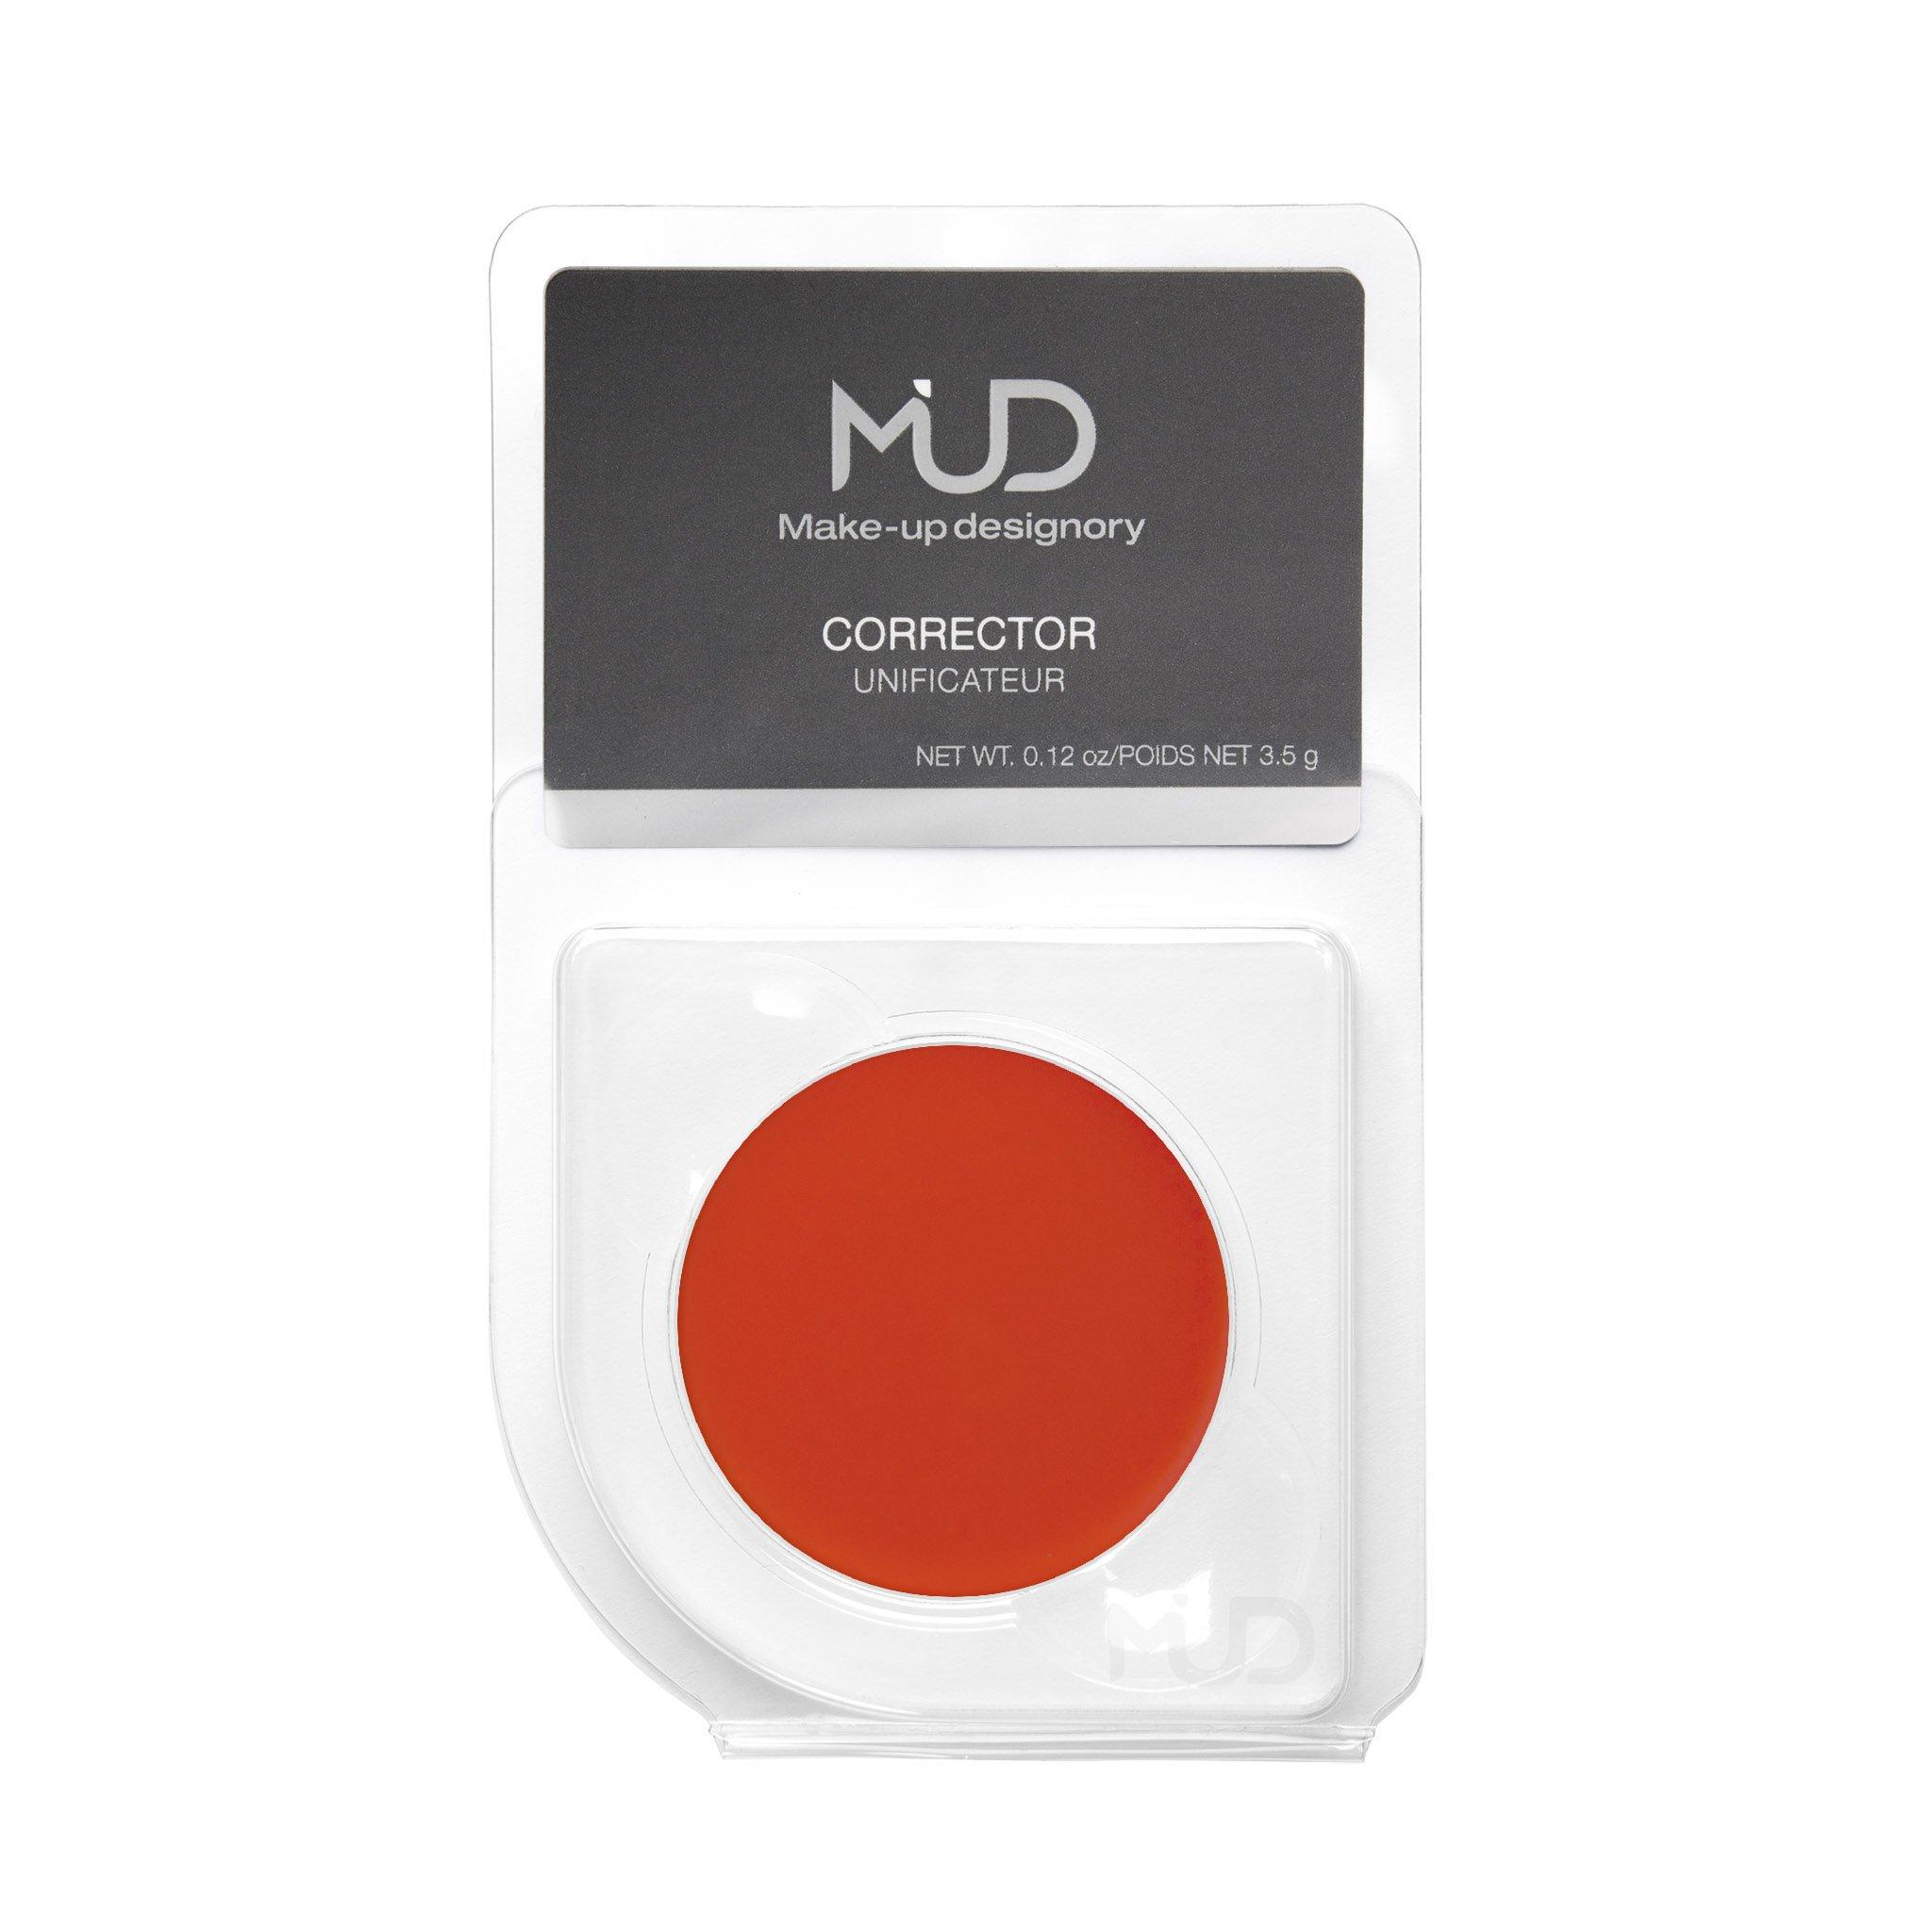 MUD Deep Brown Corrector Corrector Refill 3.5 g